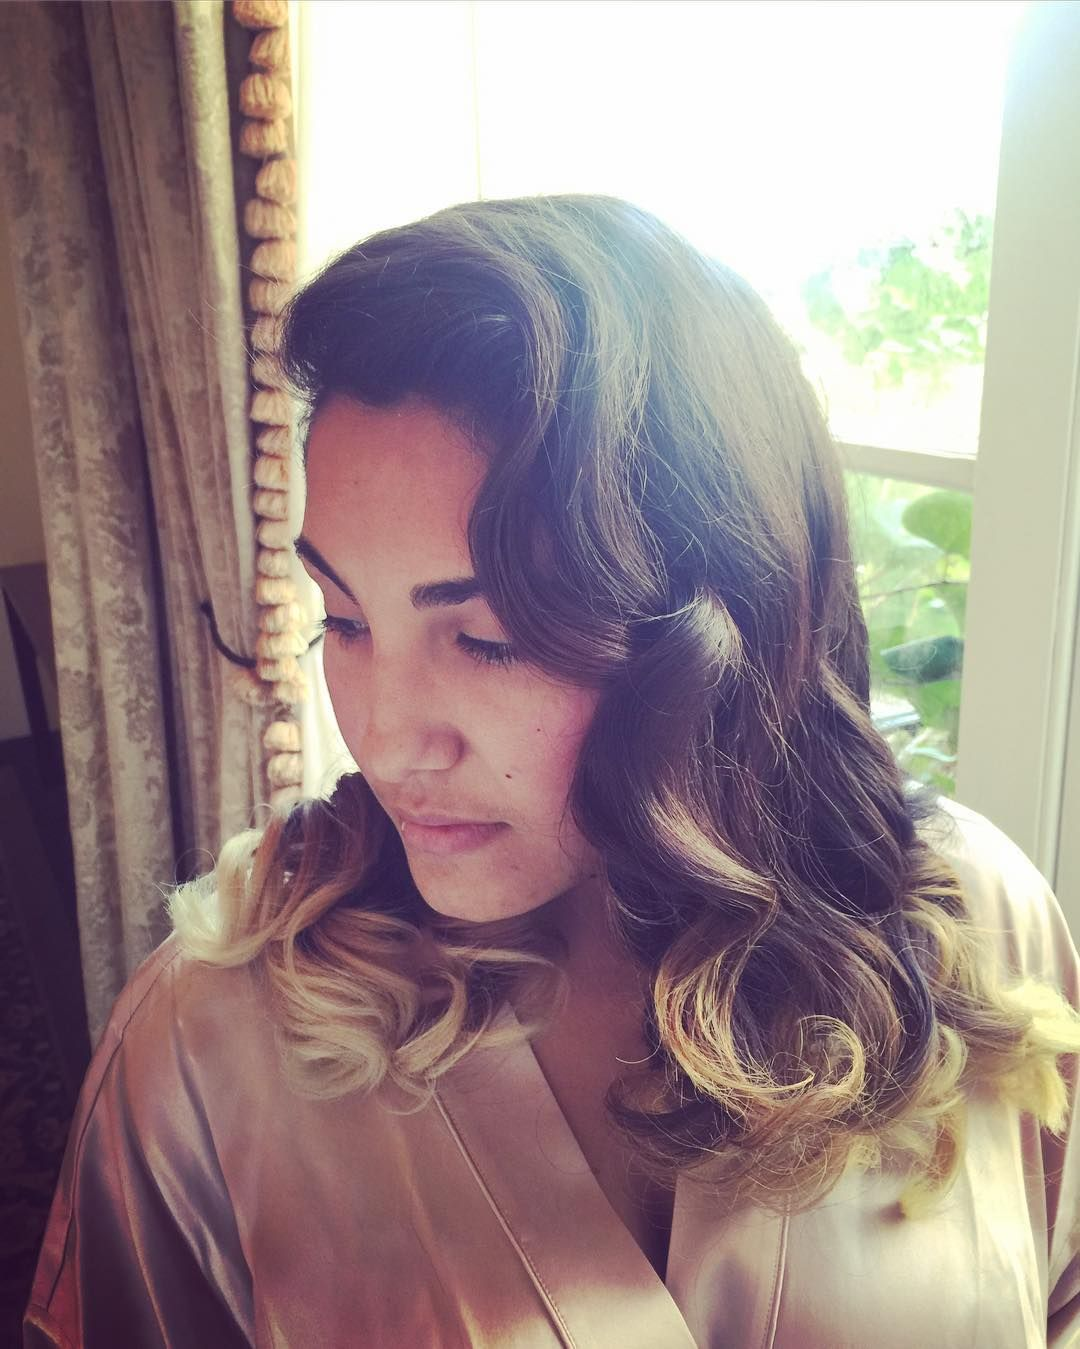 Vintage glam waves  #hair #hairstylist #hairstyle #style #hairideas #curls #waves #vintagehair #bridesmaid #wedding #weddinghair #weddingideas #bridal #elledamianhair #Alamango #Bridal #Textiles #Wedding #AlamangoBridal #AlamangoTextiles #Malta #LoveMalta #Bridesmaid #WeddingDress